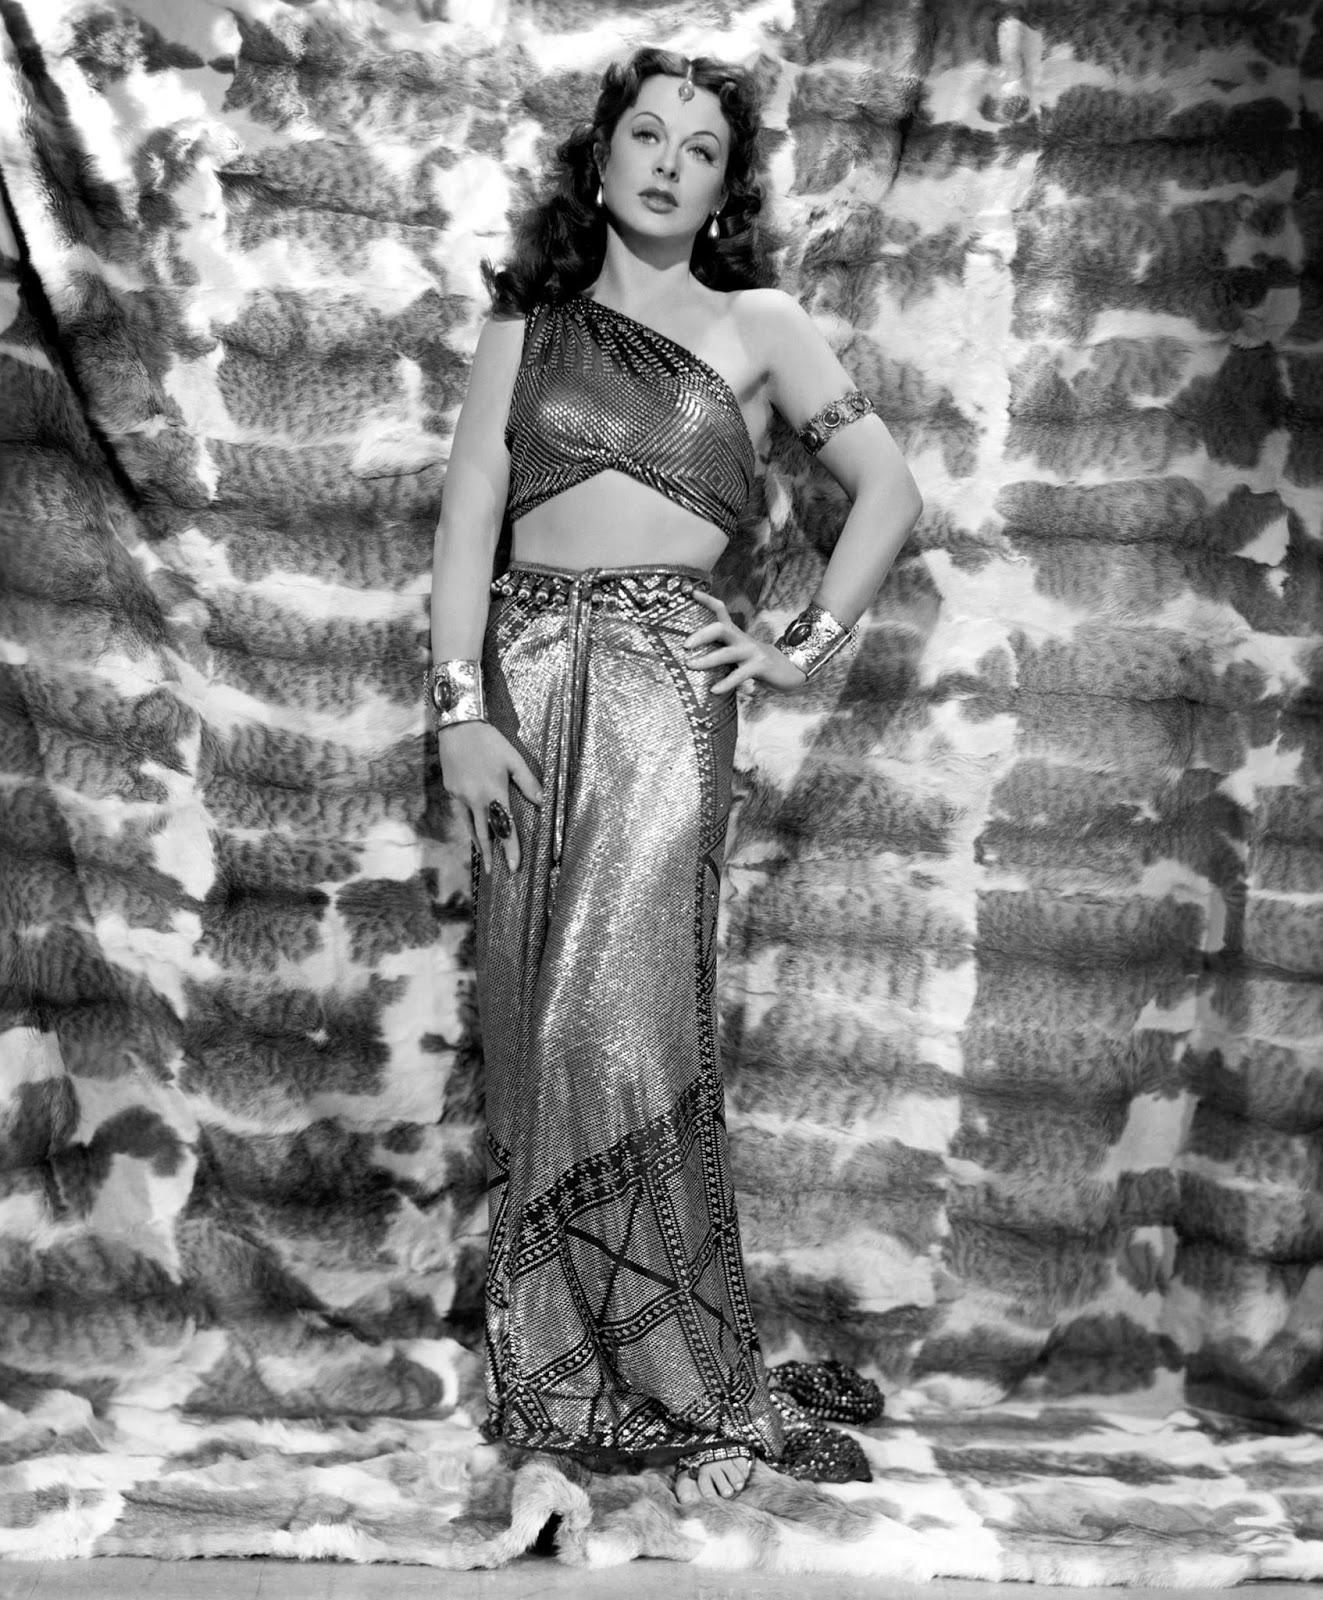 Delilah (Hedy Lamarr)